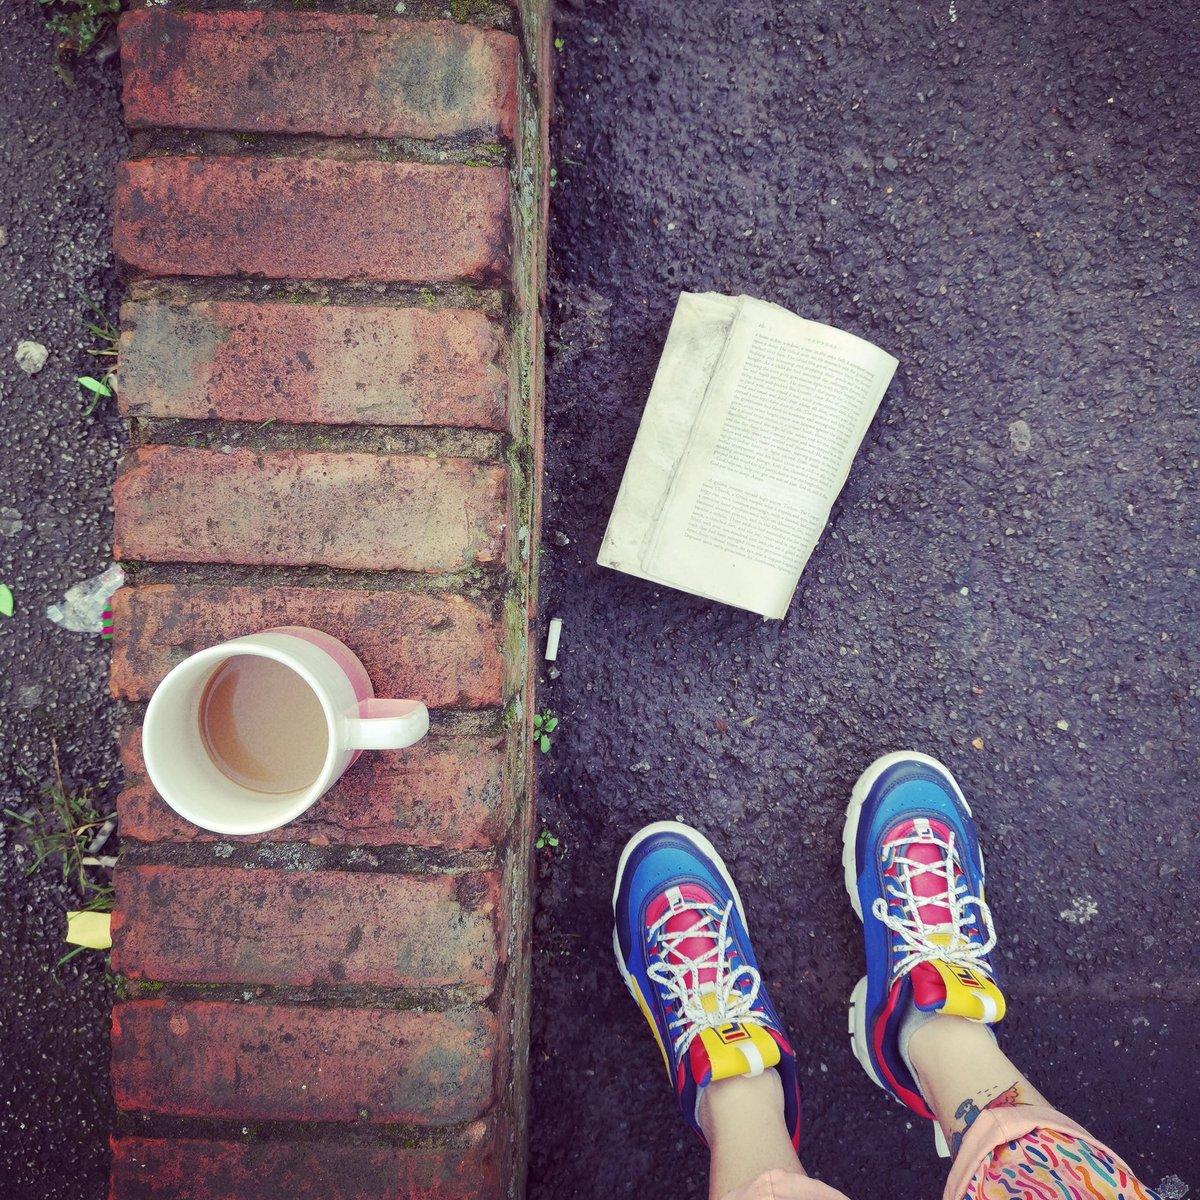 Arty Morning Hipster Photo #17  #artinnit #fila #feelher #discarded #preloved #book #rain #pavement #poundingtheppic.twitter.com/Ka4nRTxjJF